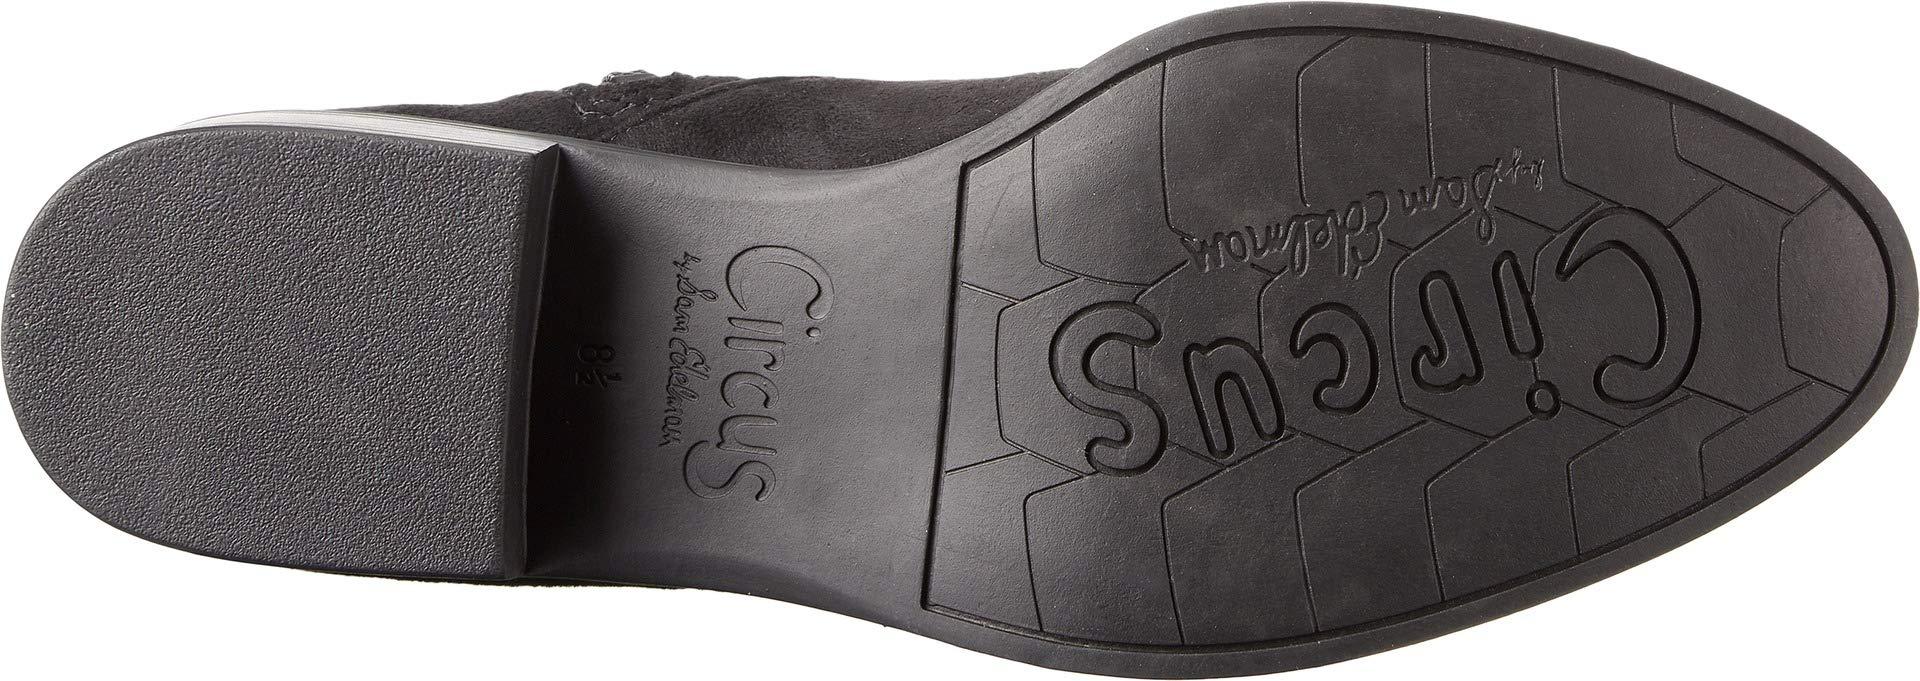 Circus by Sam Edelman Women's Peyton Over The Knee Boot, Black, 7.5 M US by Circus by Sam Edelman